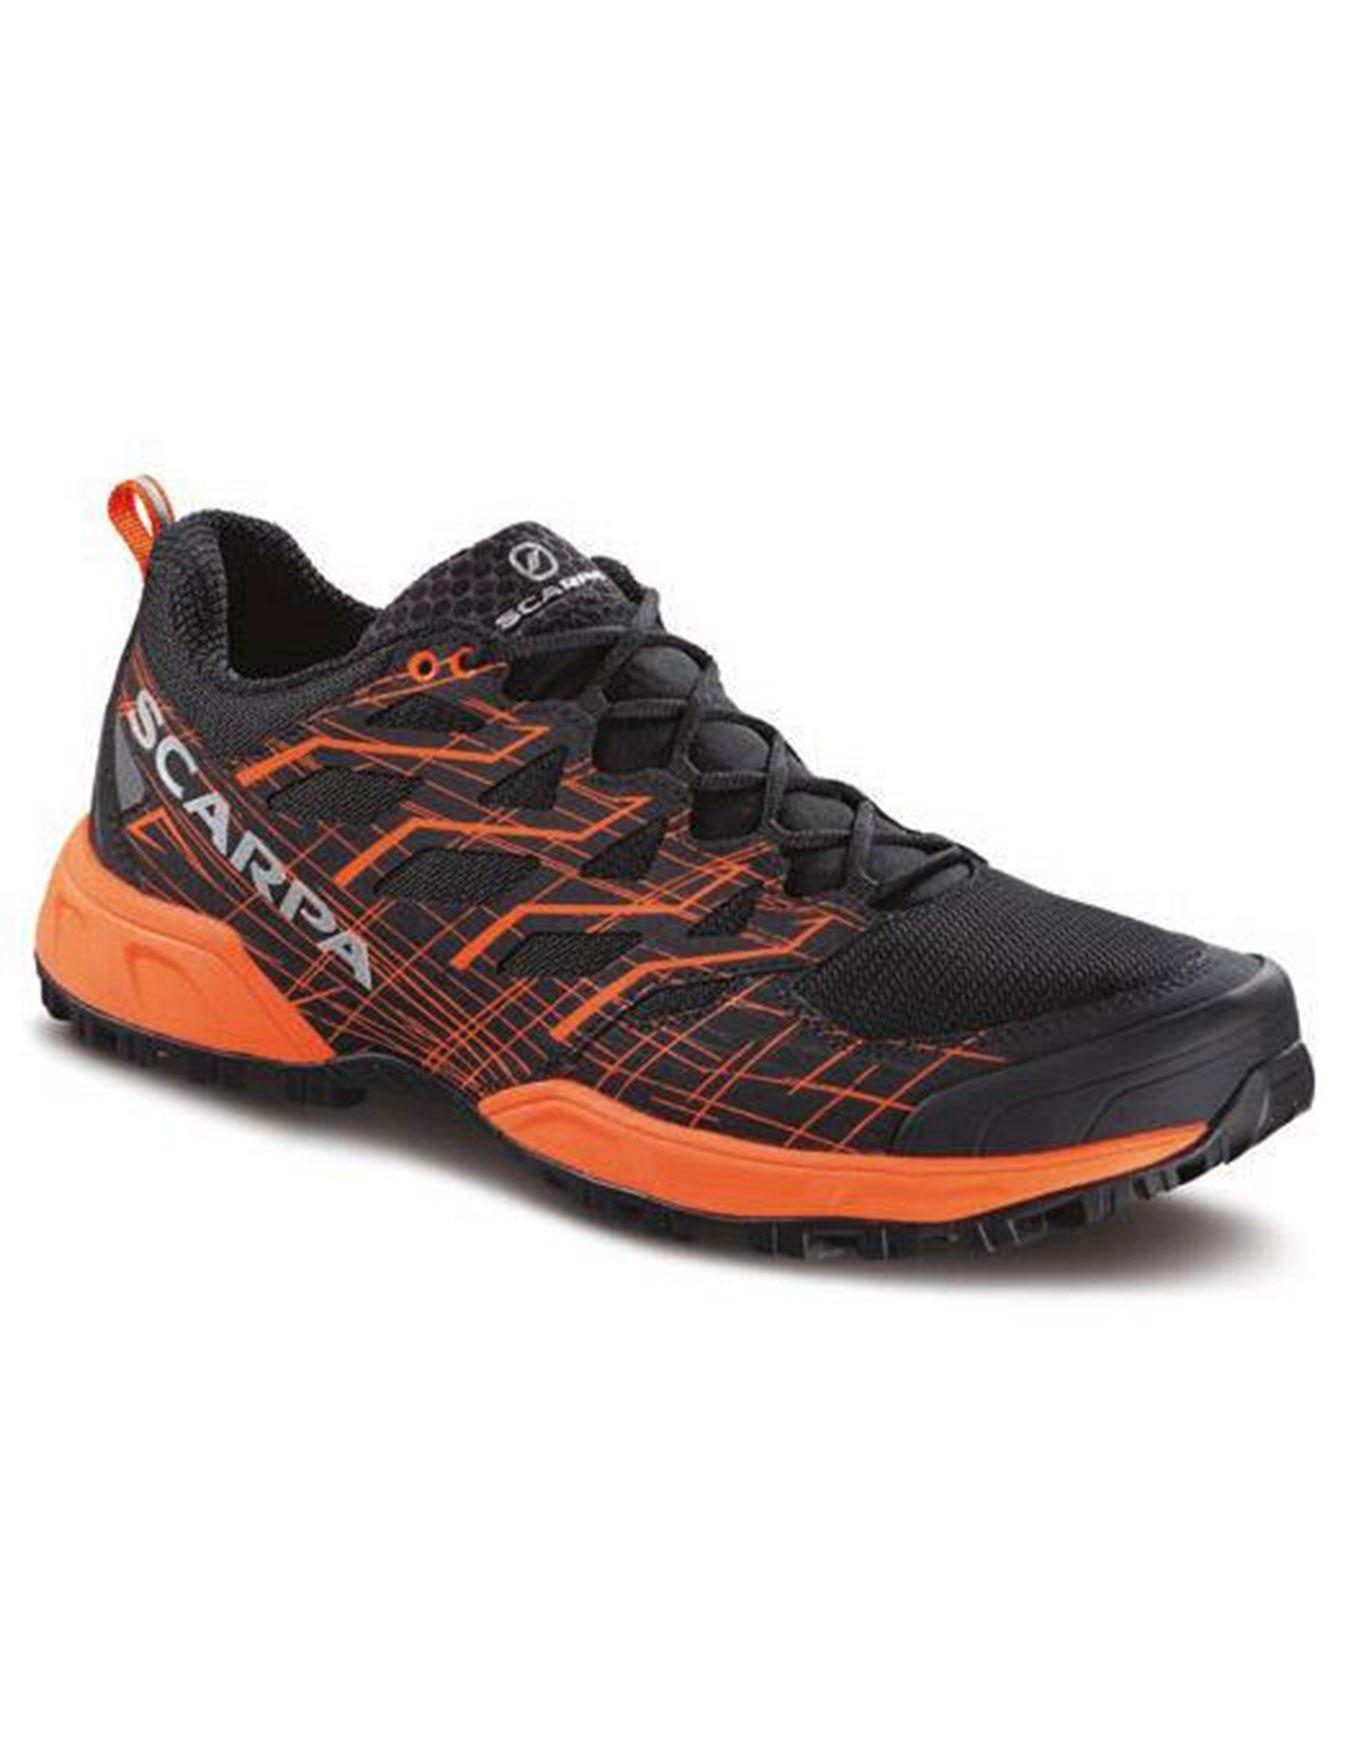 Scarpa Neutron Black Orange - Trailrunning-Schuhe